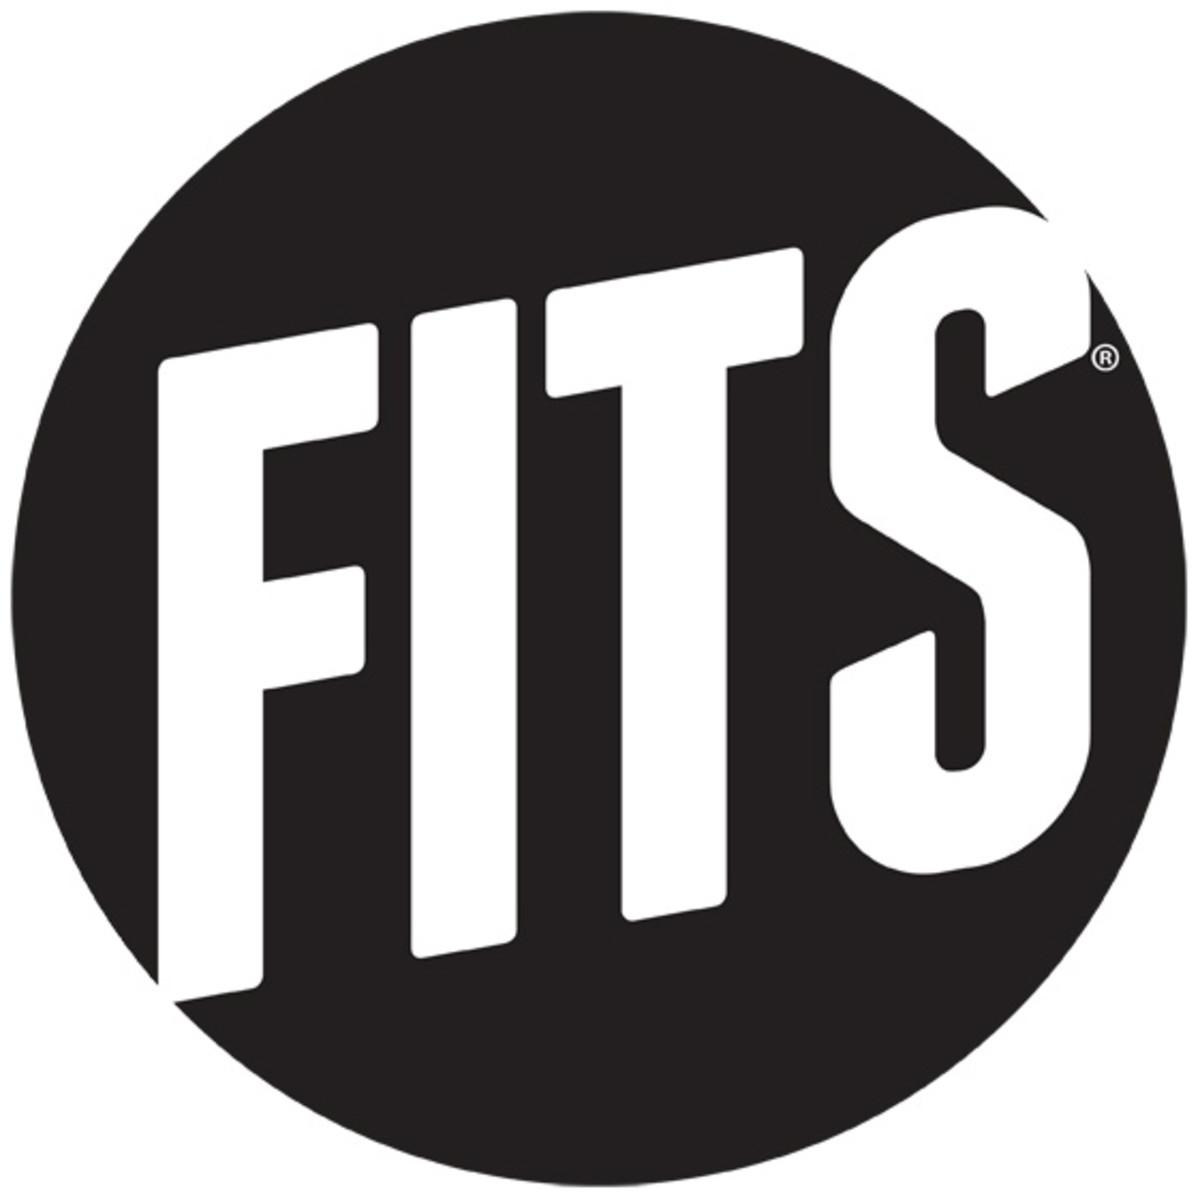 fits-logo-low-res.jpg